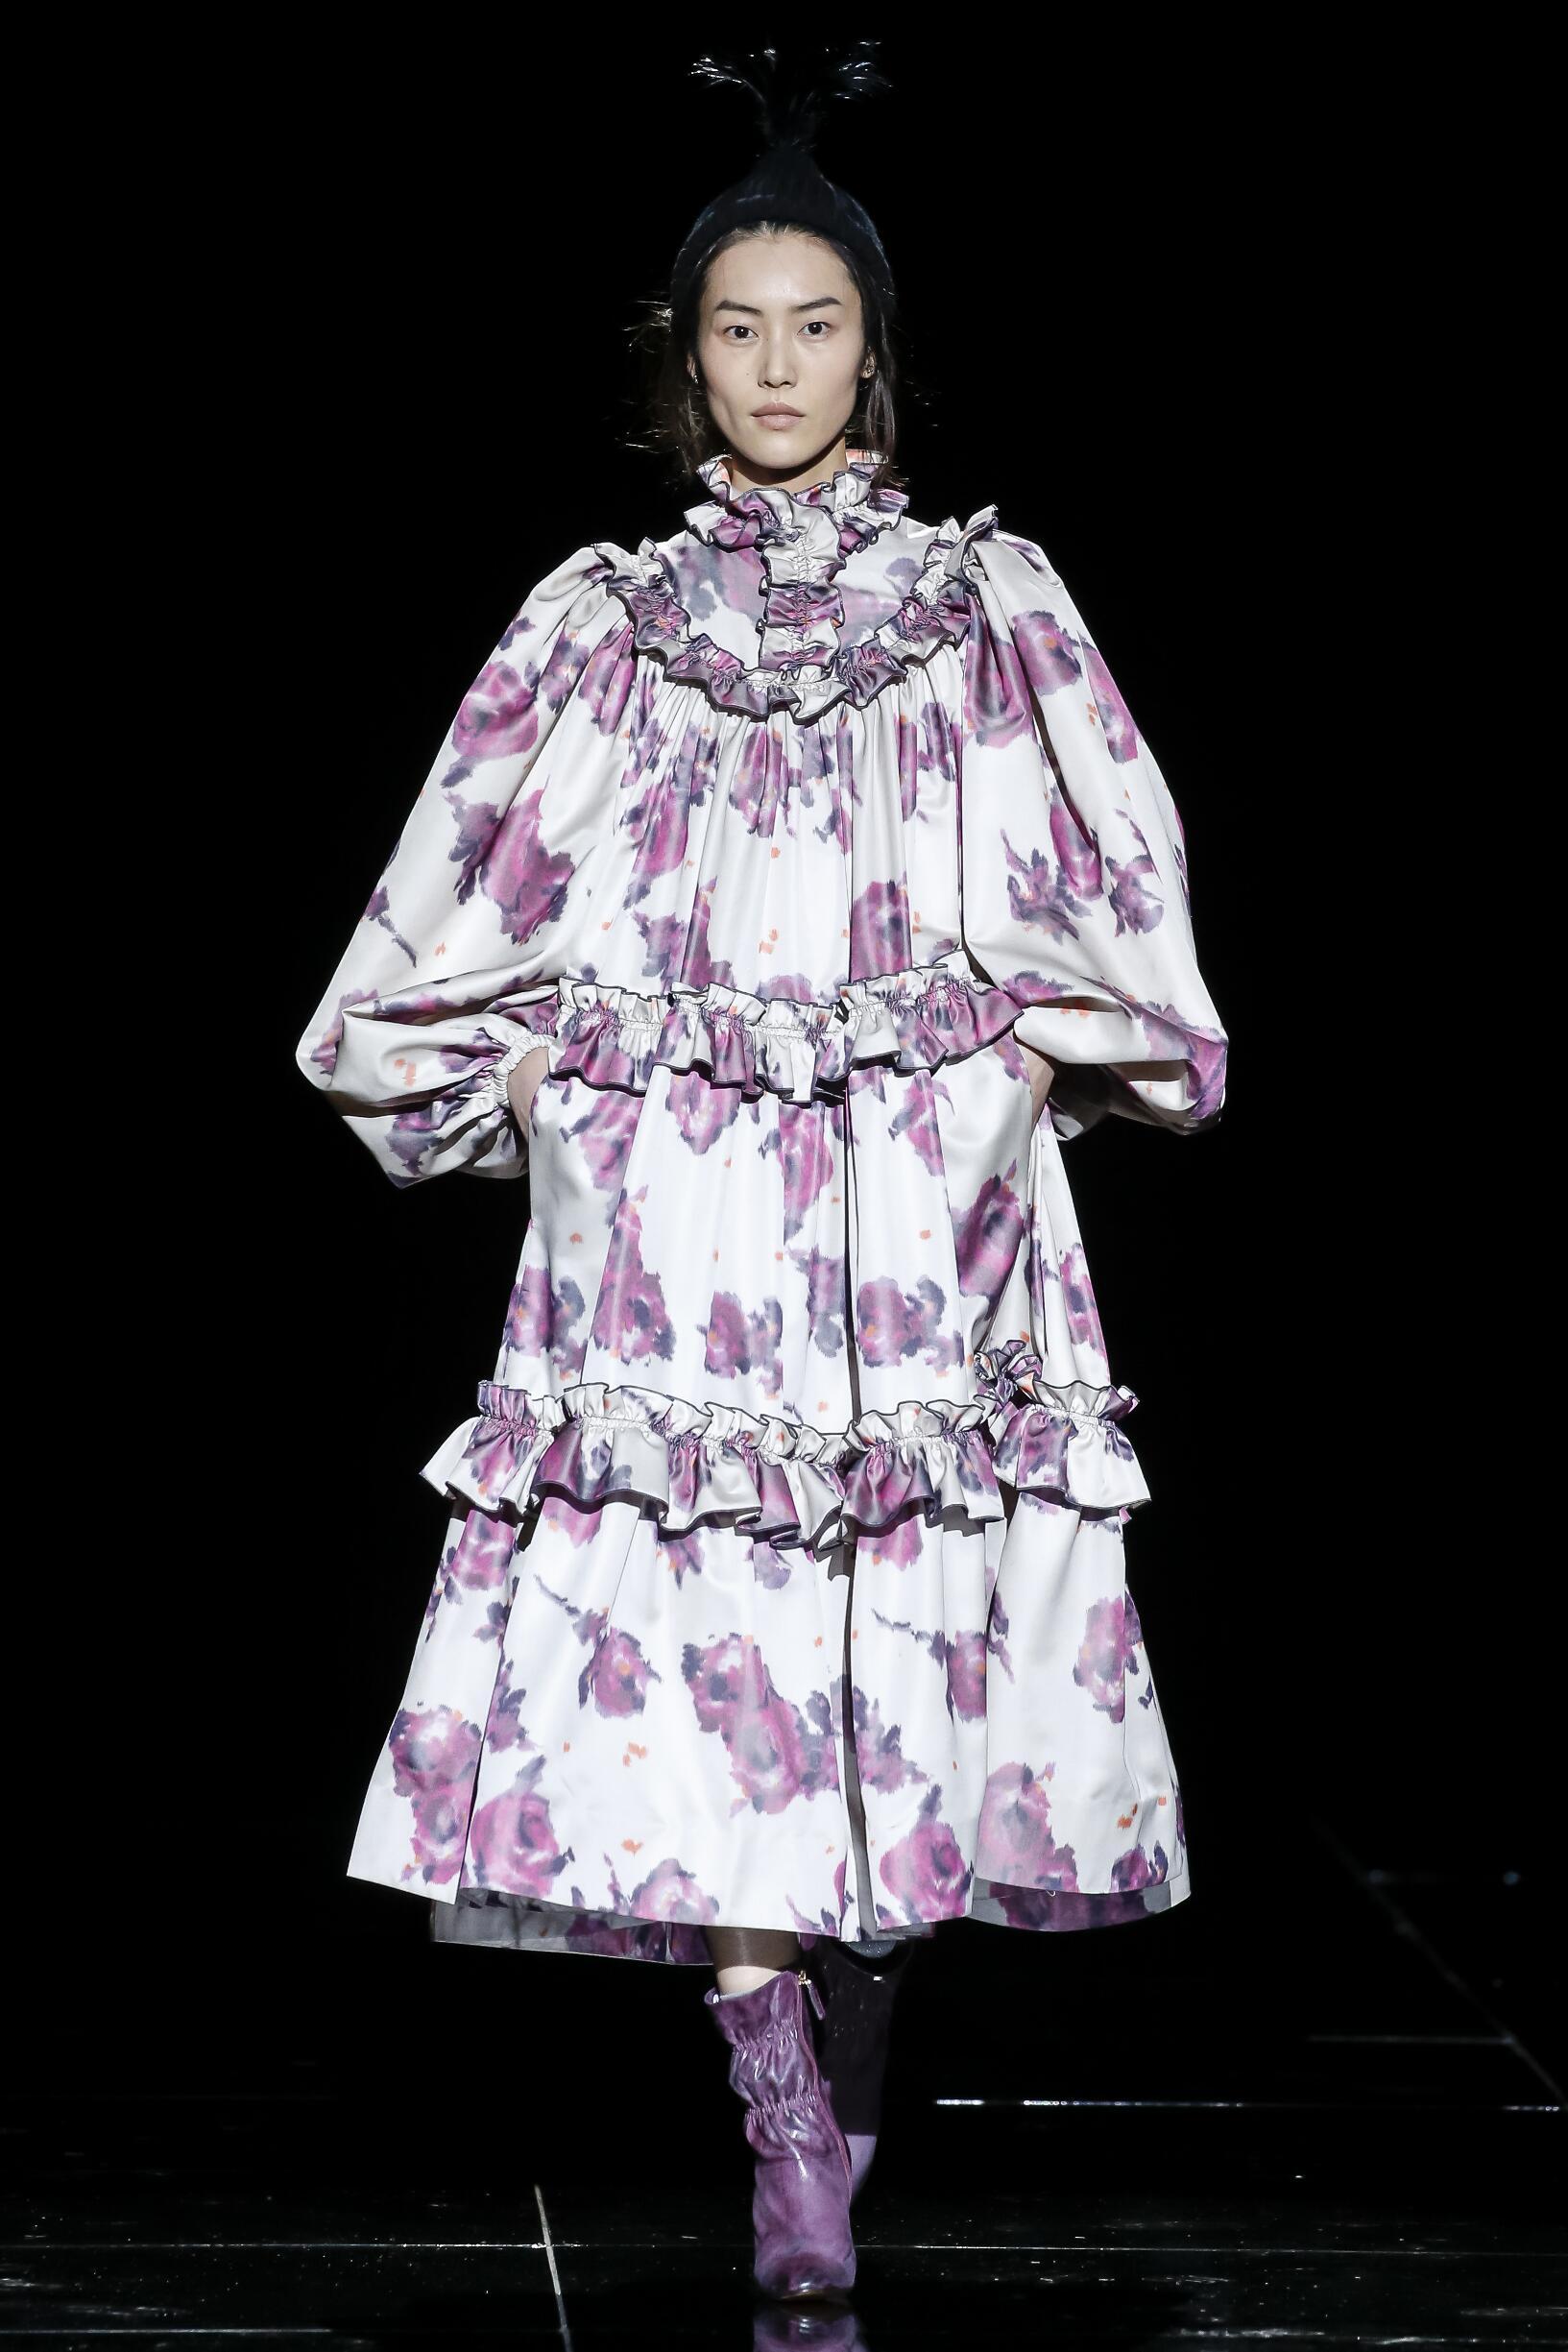 2019 Catwalk Marc Jacobs Woman Fashion Show Winter